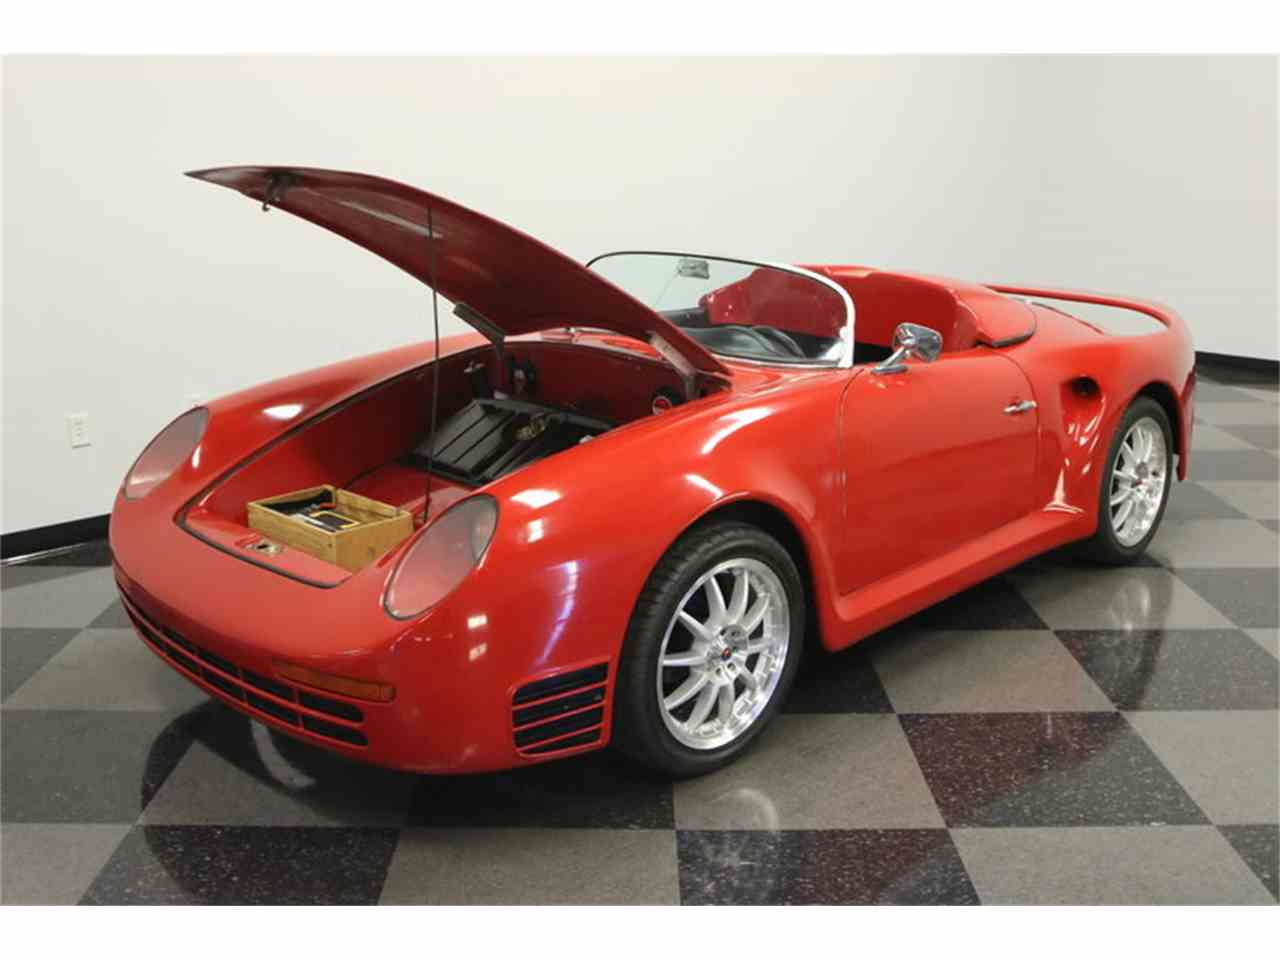 Large Picture of 1994 359 Replica located in Florida - $18,900.00 - LTAU